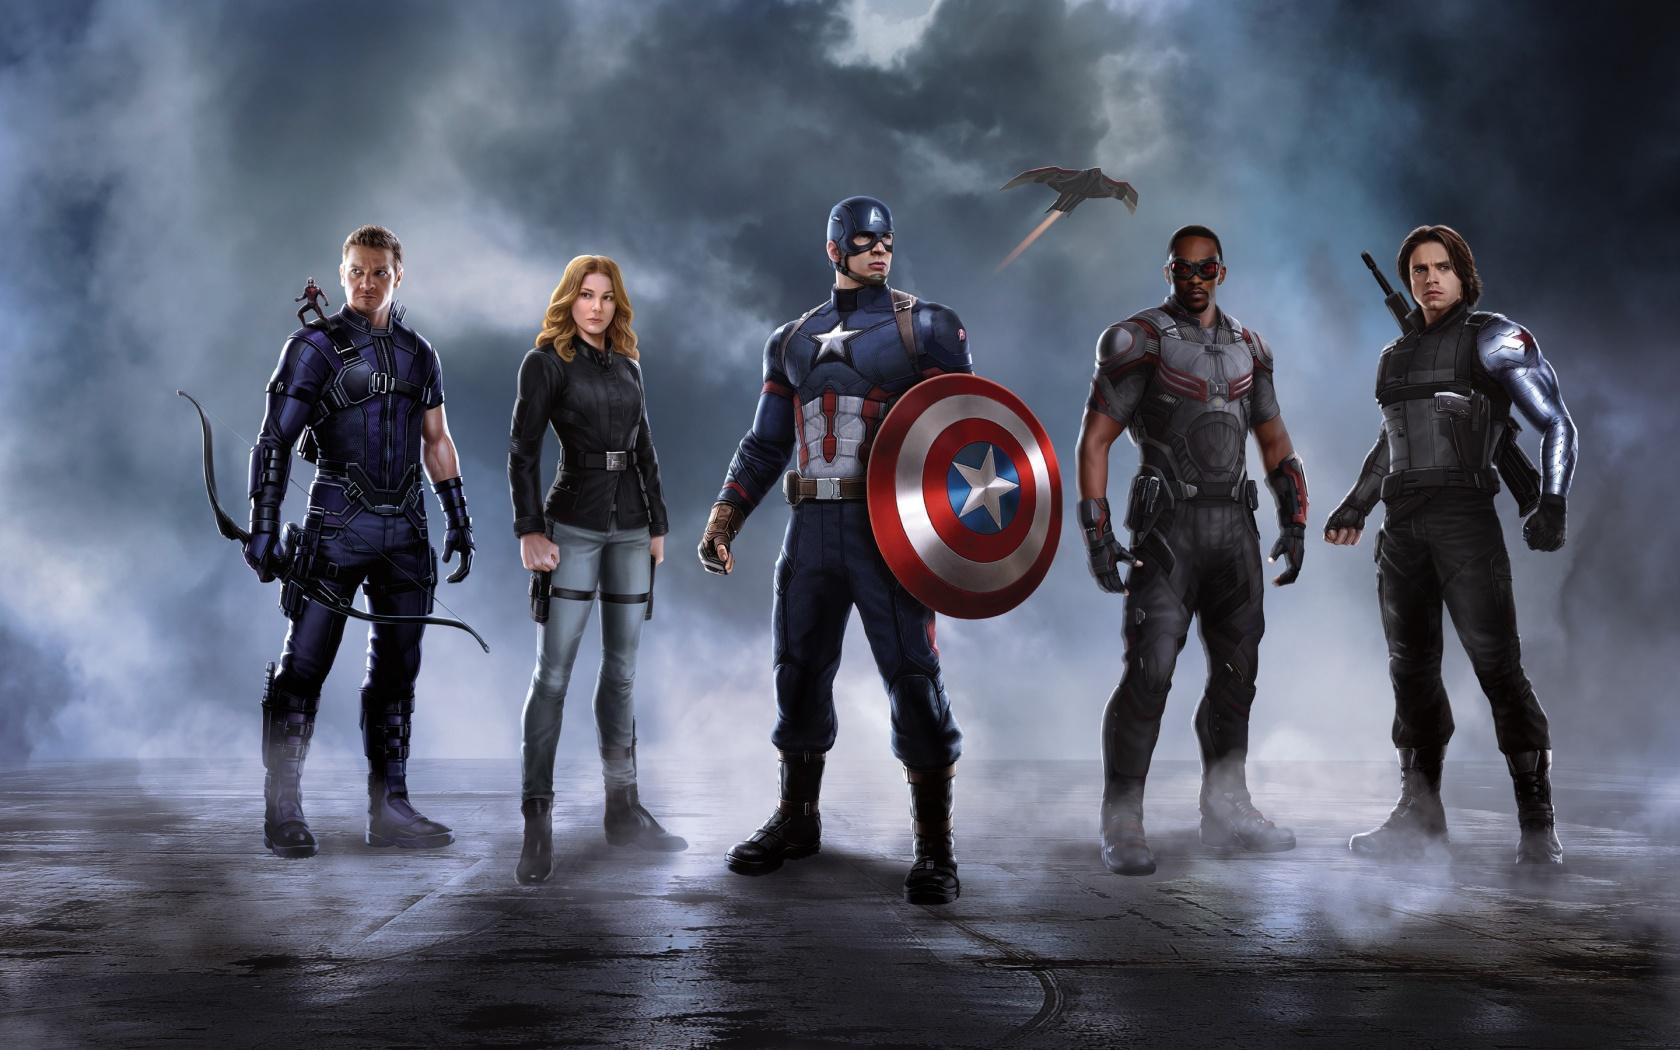 Civil War Captain America Team Wallpapers HD Wallpapers 1680x1050